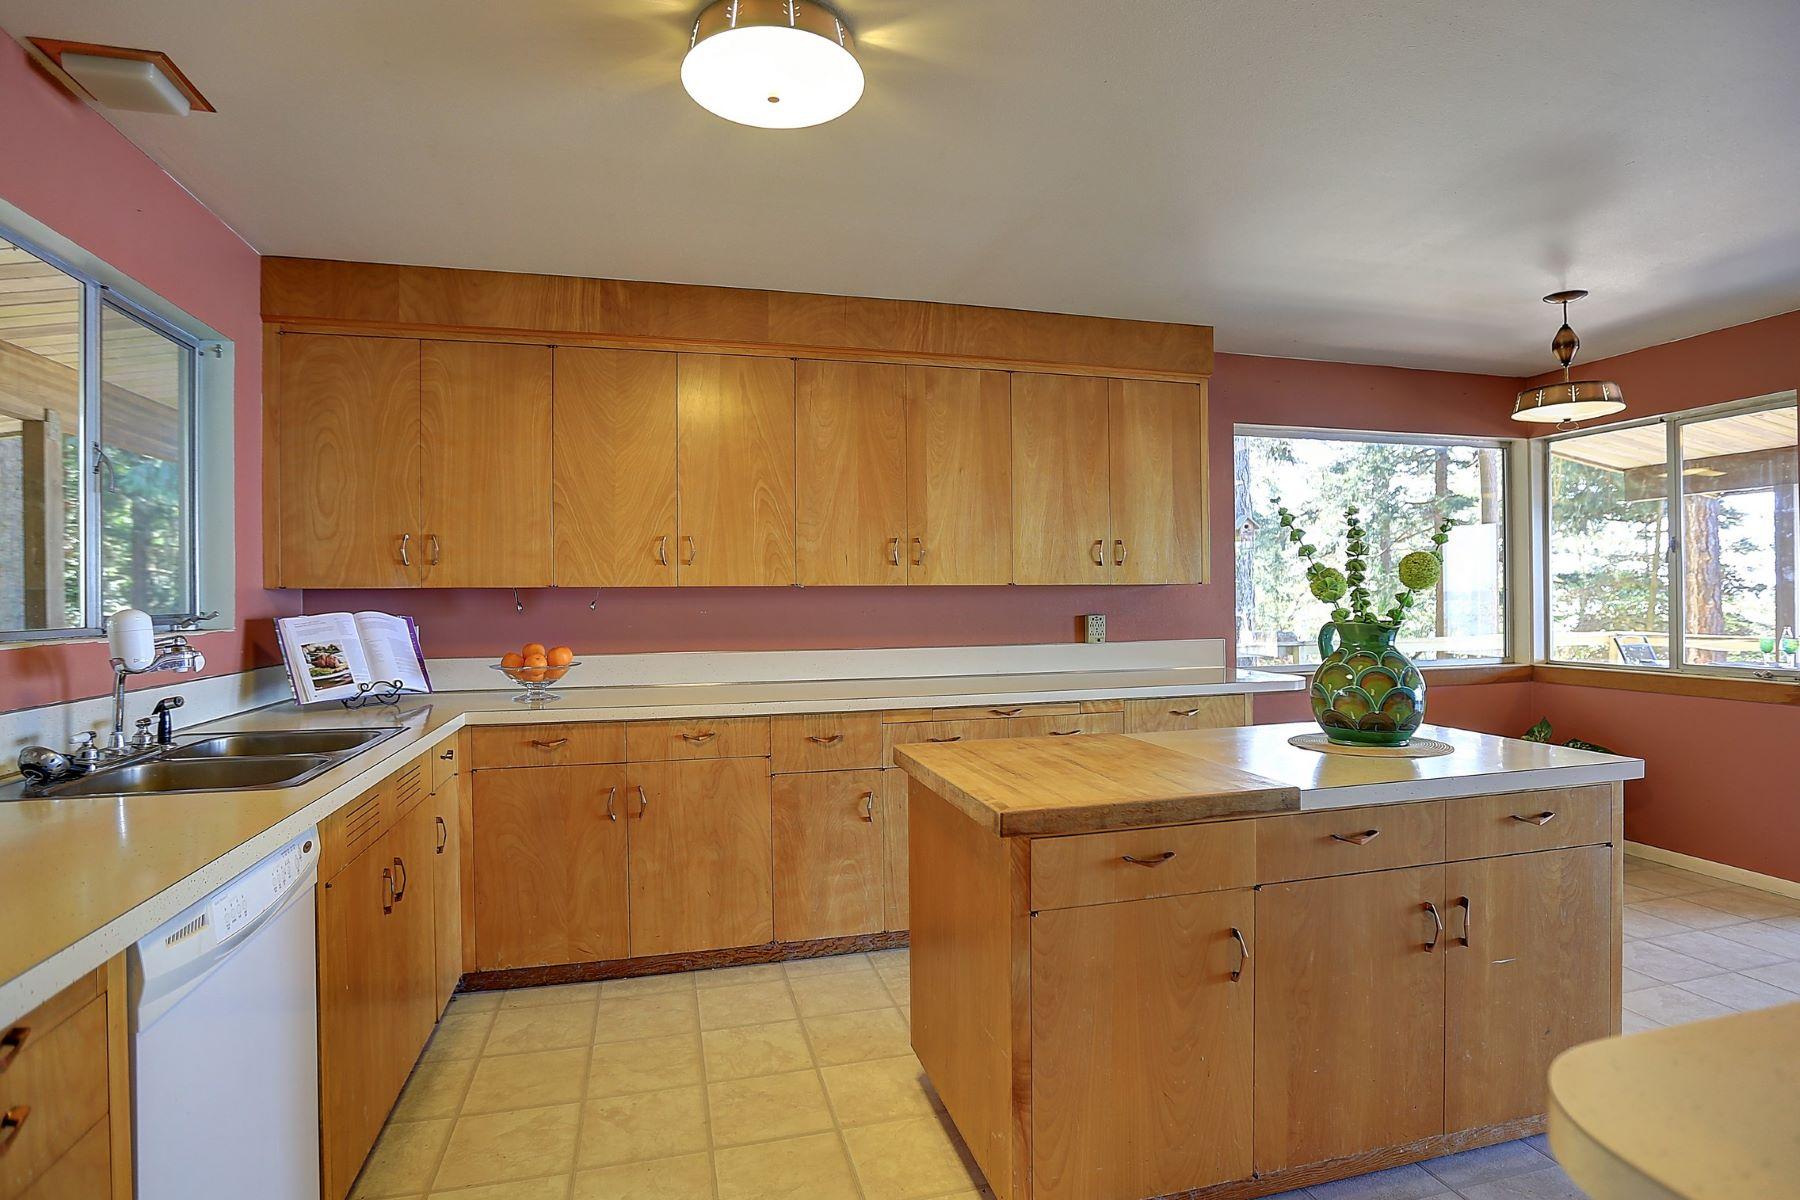 Additional photo for property listing at 843 N Sunset Dr 843 N Sunset Dr Camano Island, Washington 98282 United States